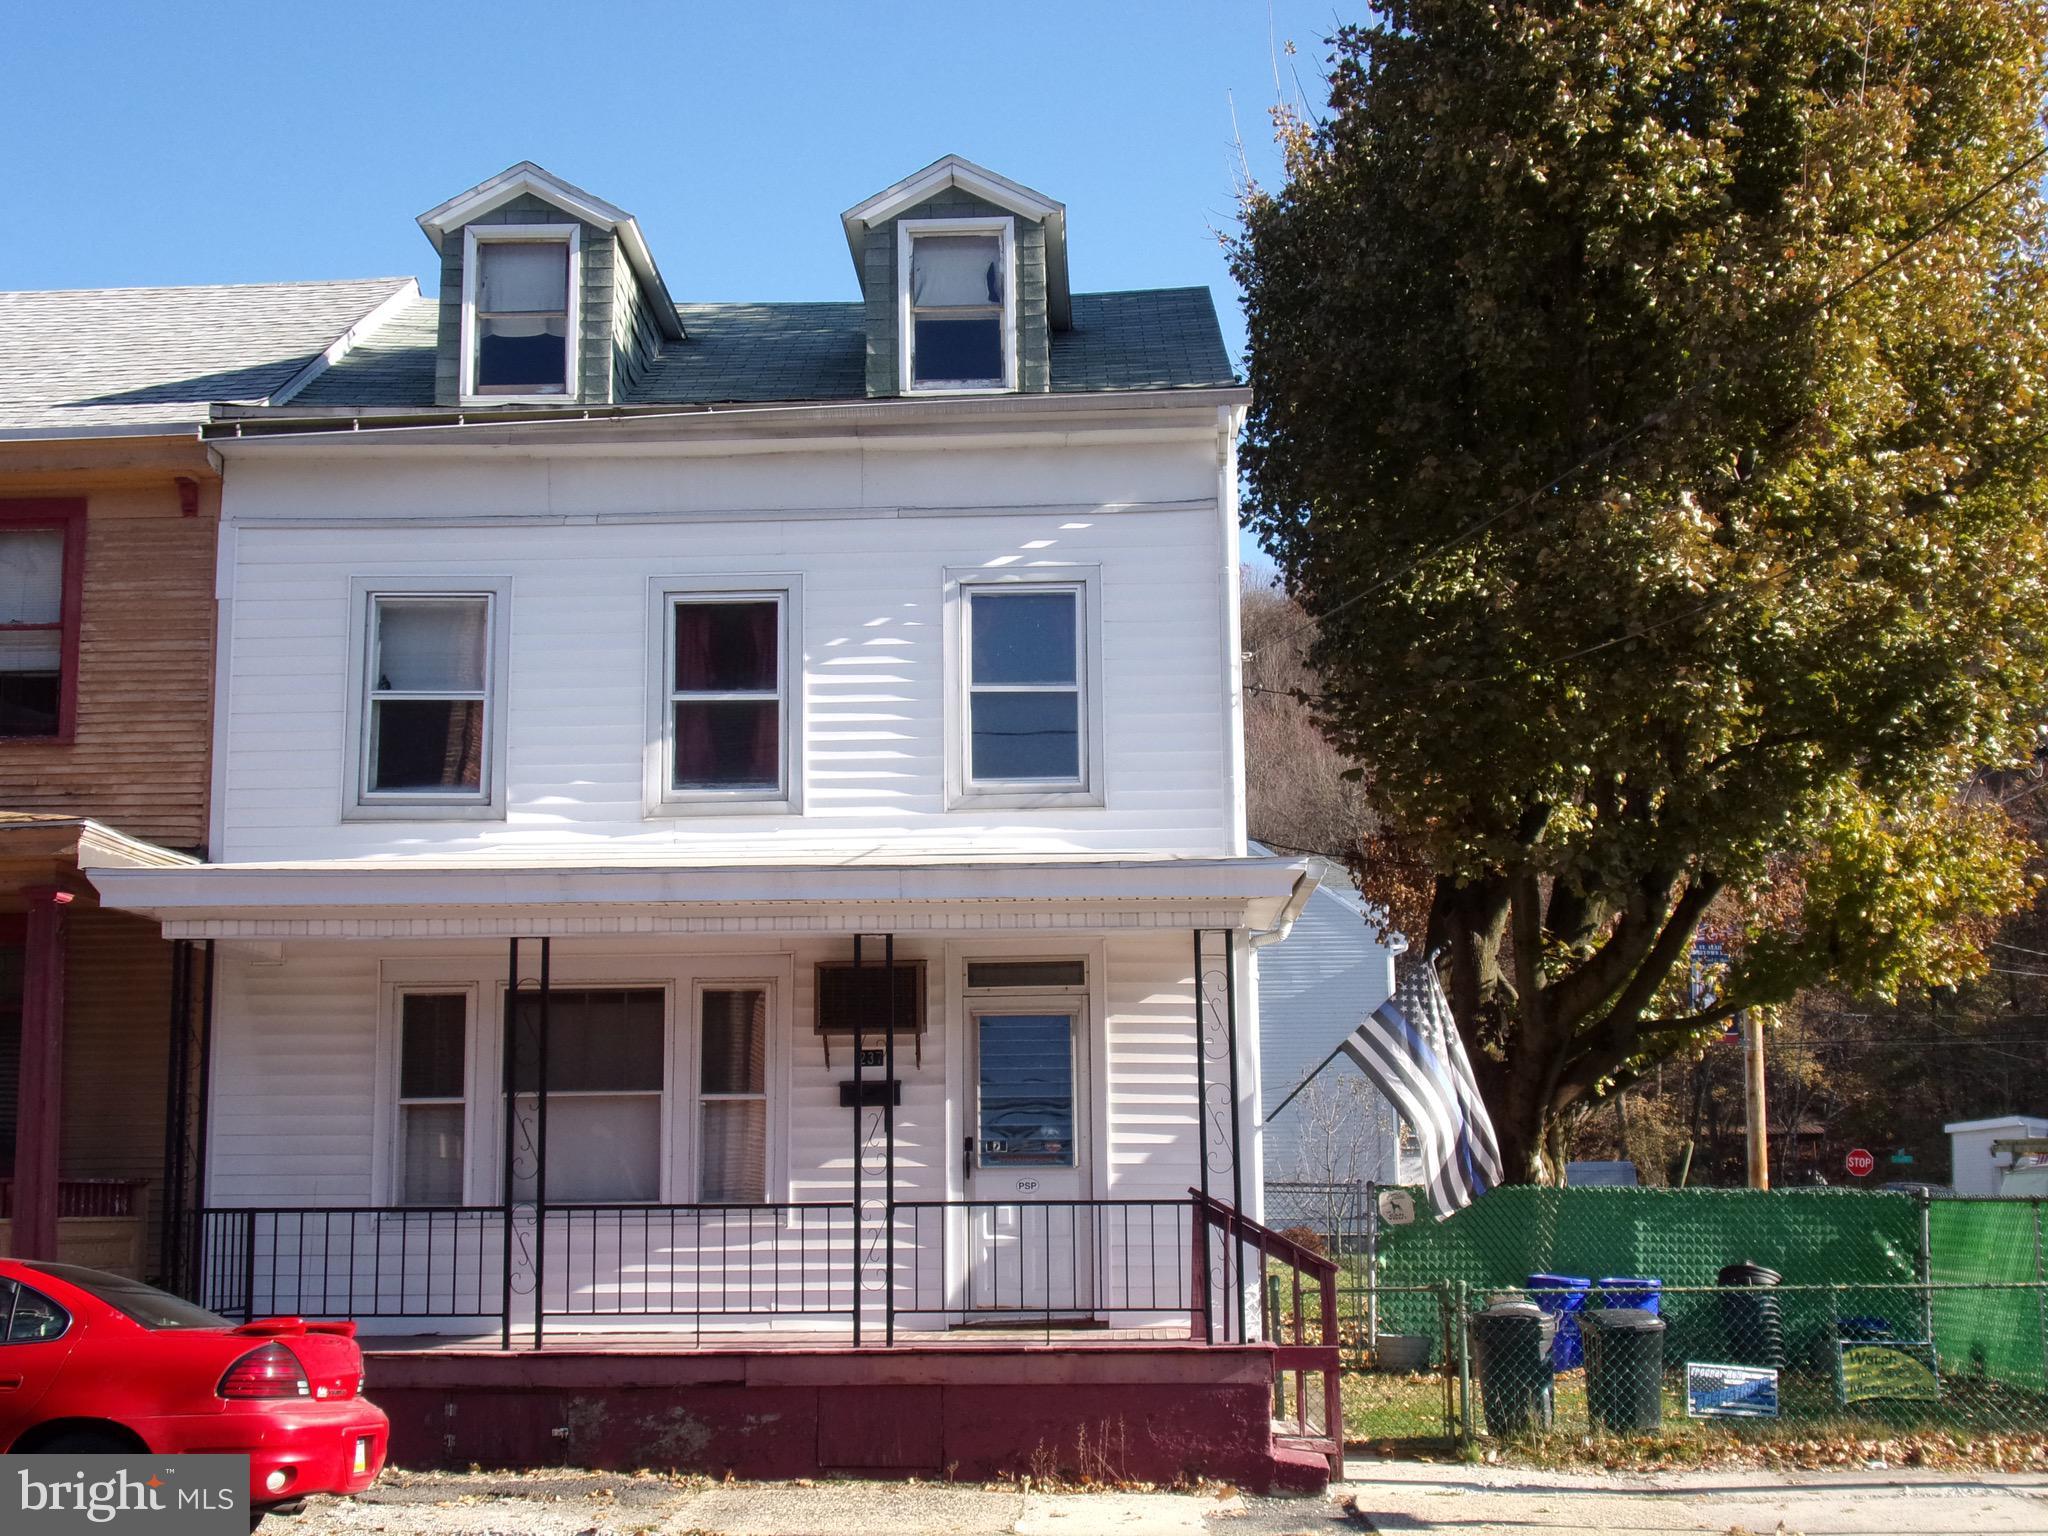 237 S NICHOLAS STREET, SAINT CLAIR, PA 17970